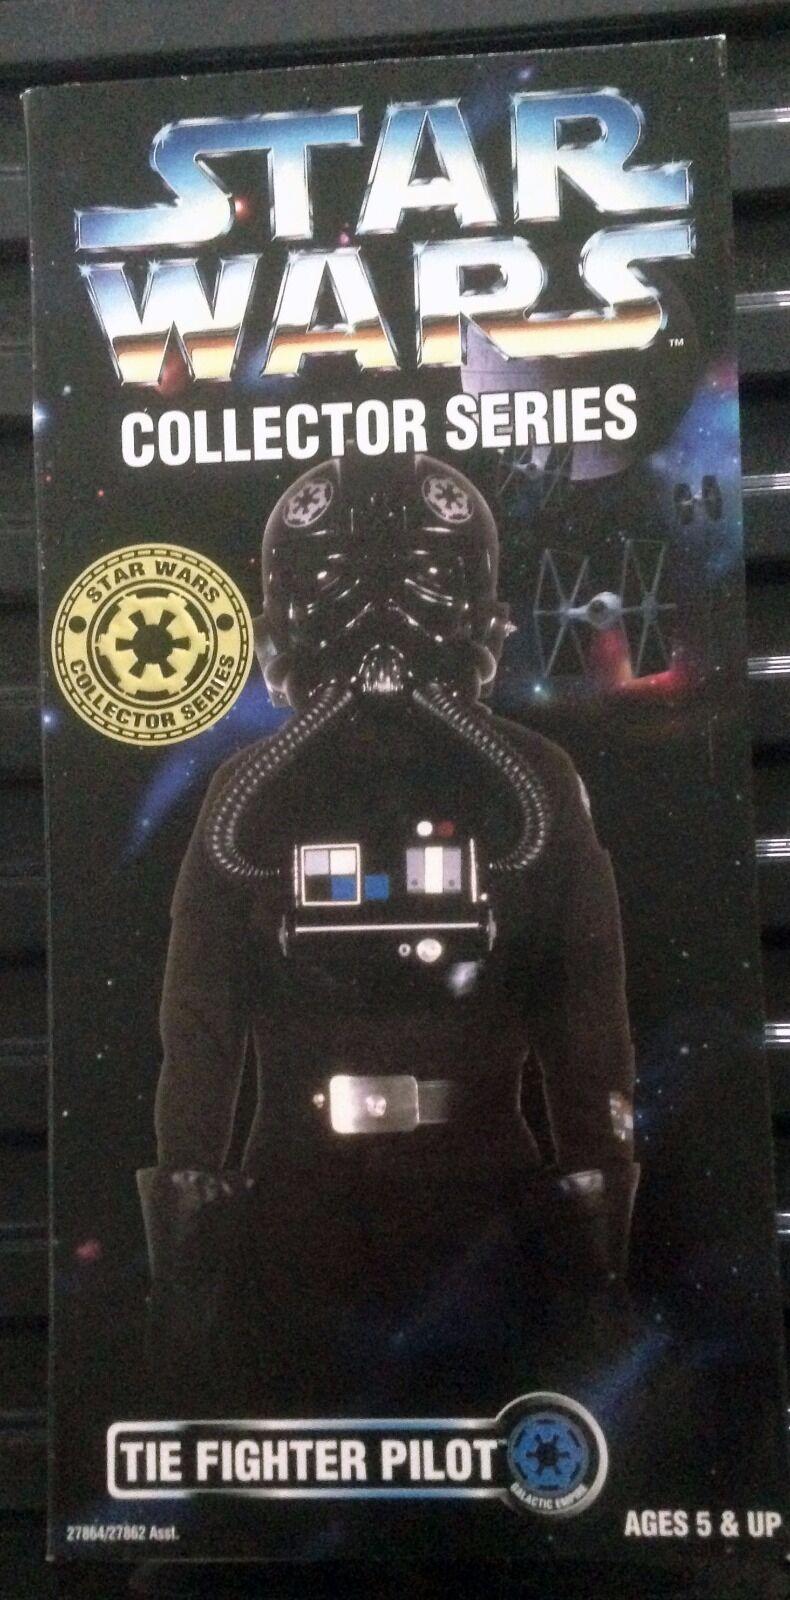 Star Wars Collector Series 12  Tie Fighter Pilot